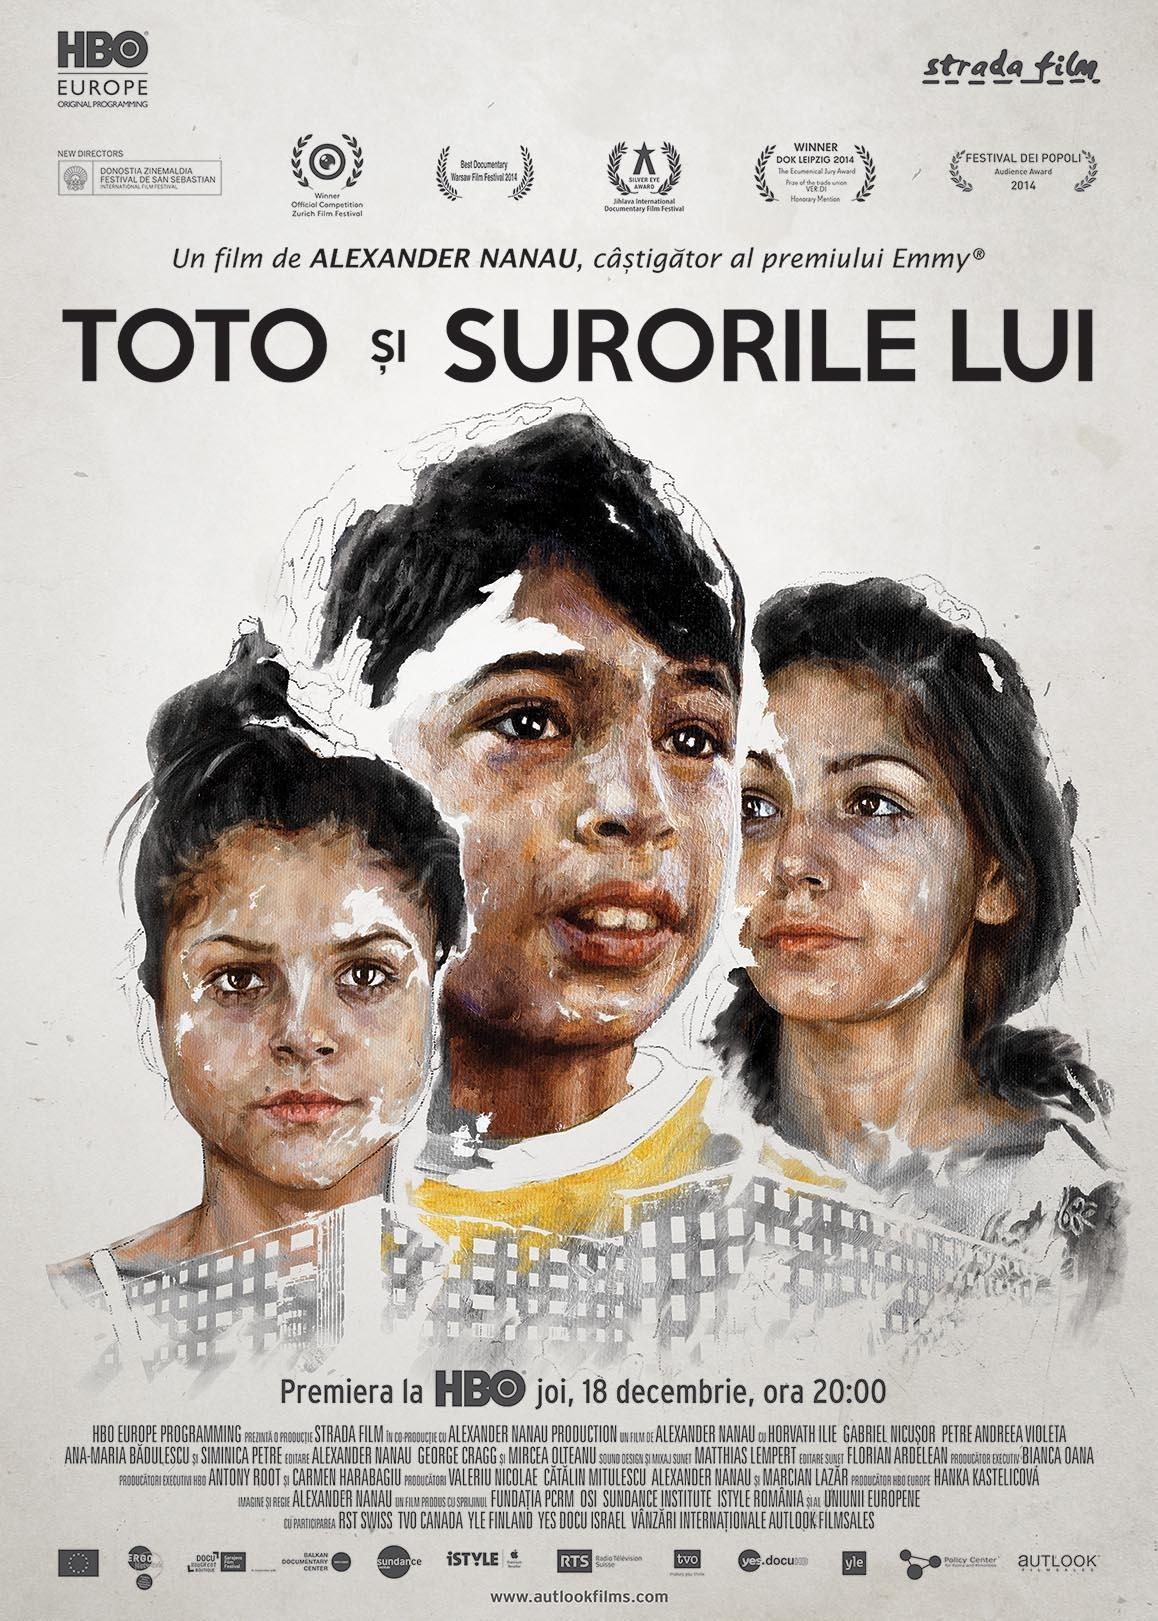 Toto și surorile lui - Toto și surorile lui (2014) - Film